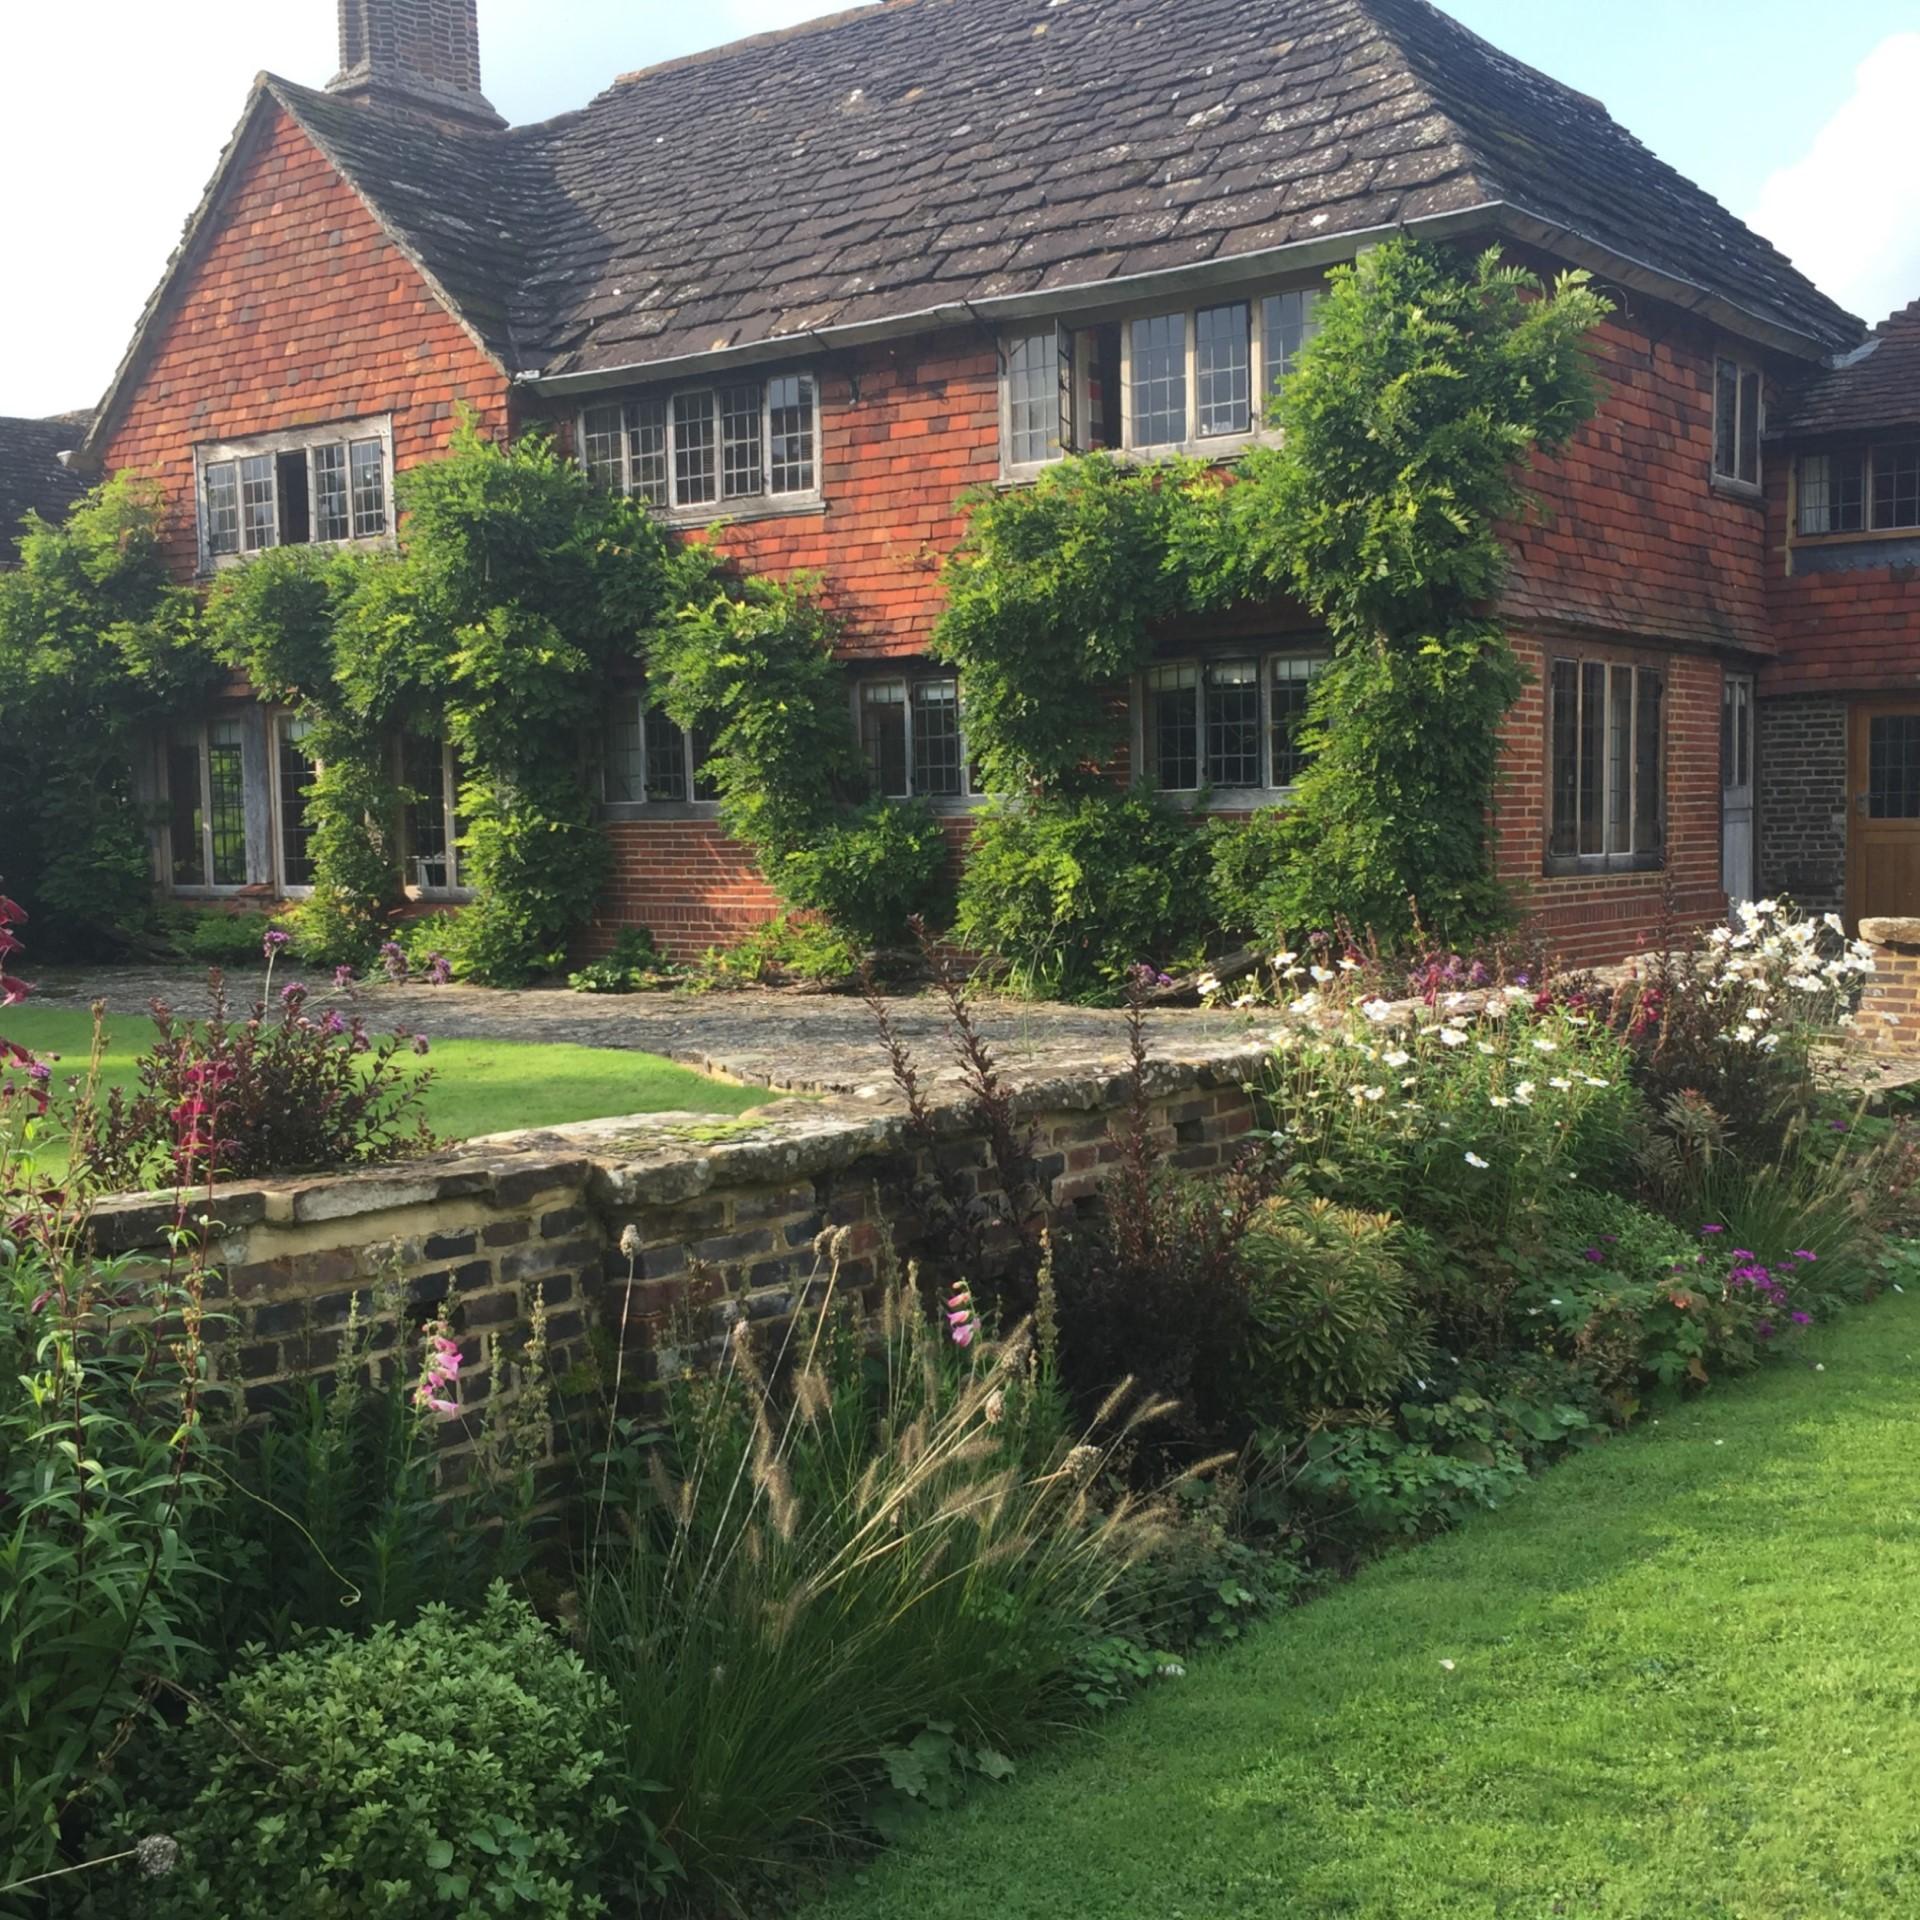 Landscape Design Surrey: Laurel Hill Gardens: Landscape Garden Design In The Surrey